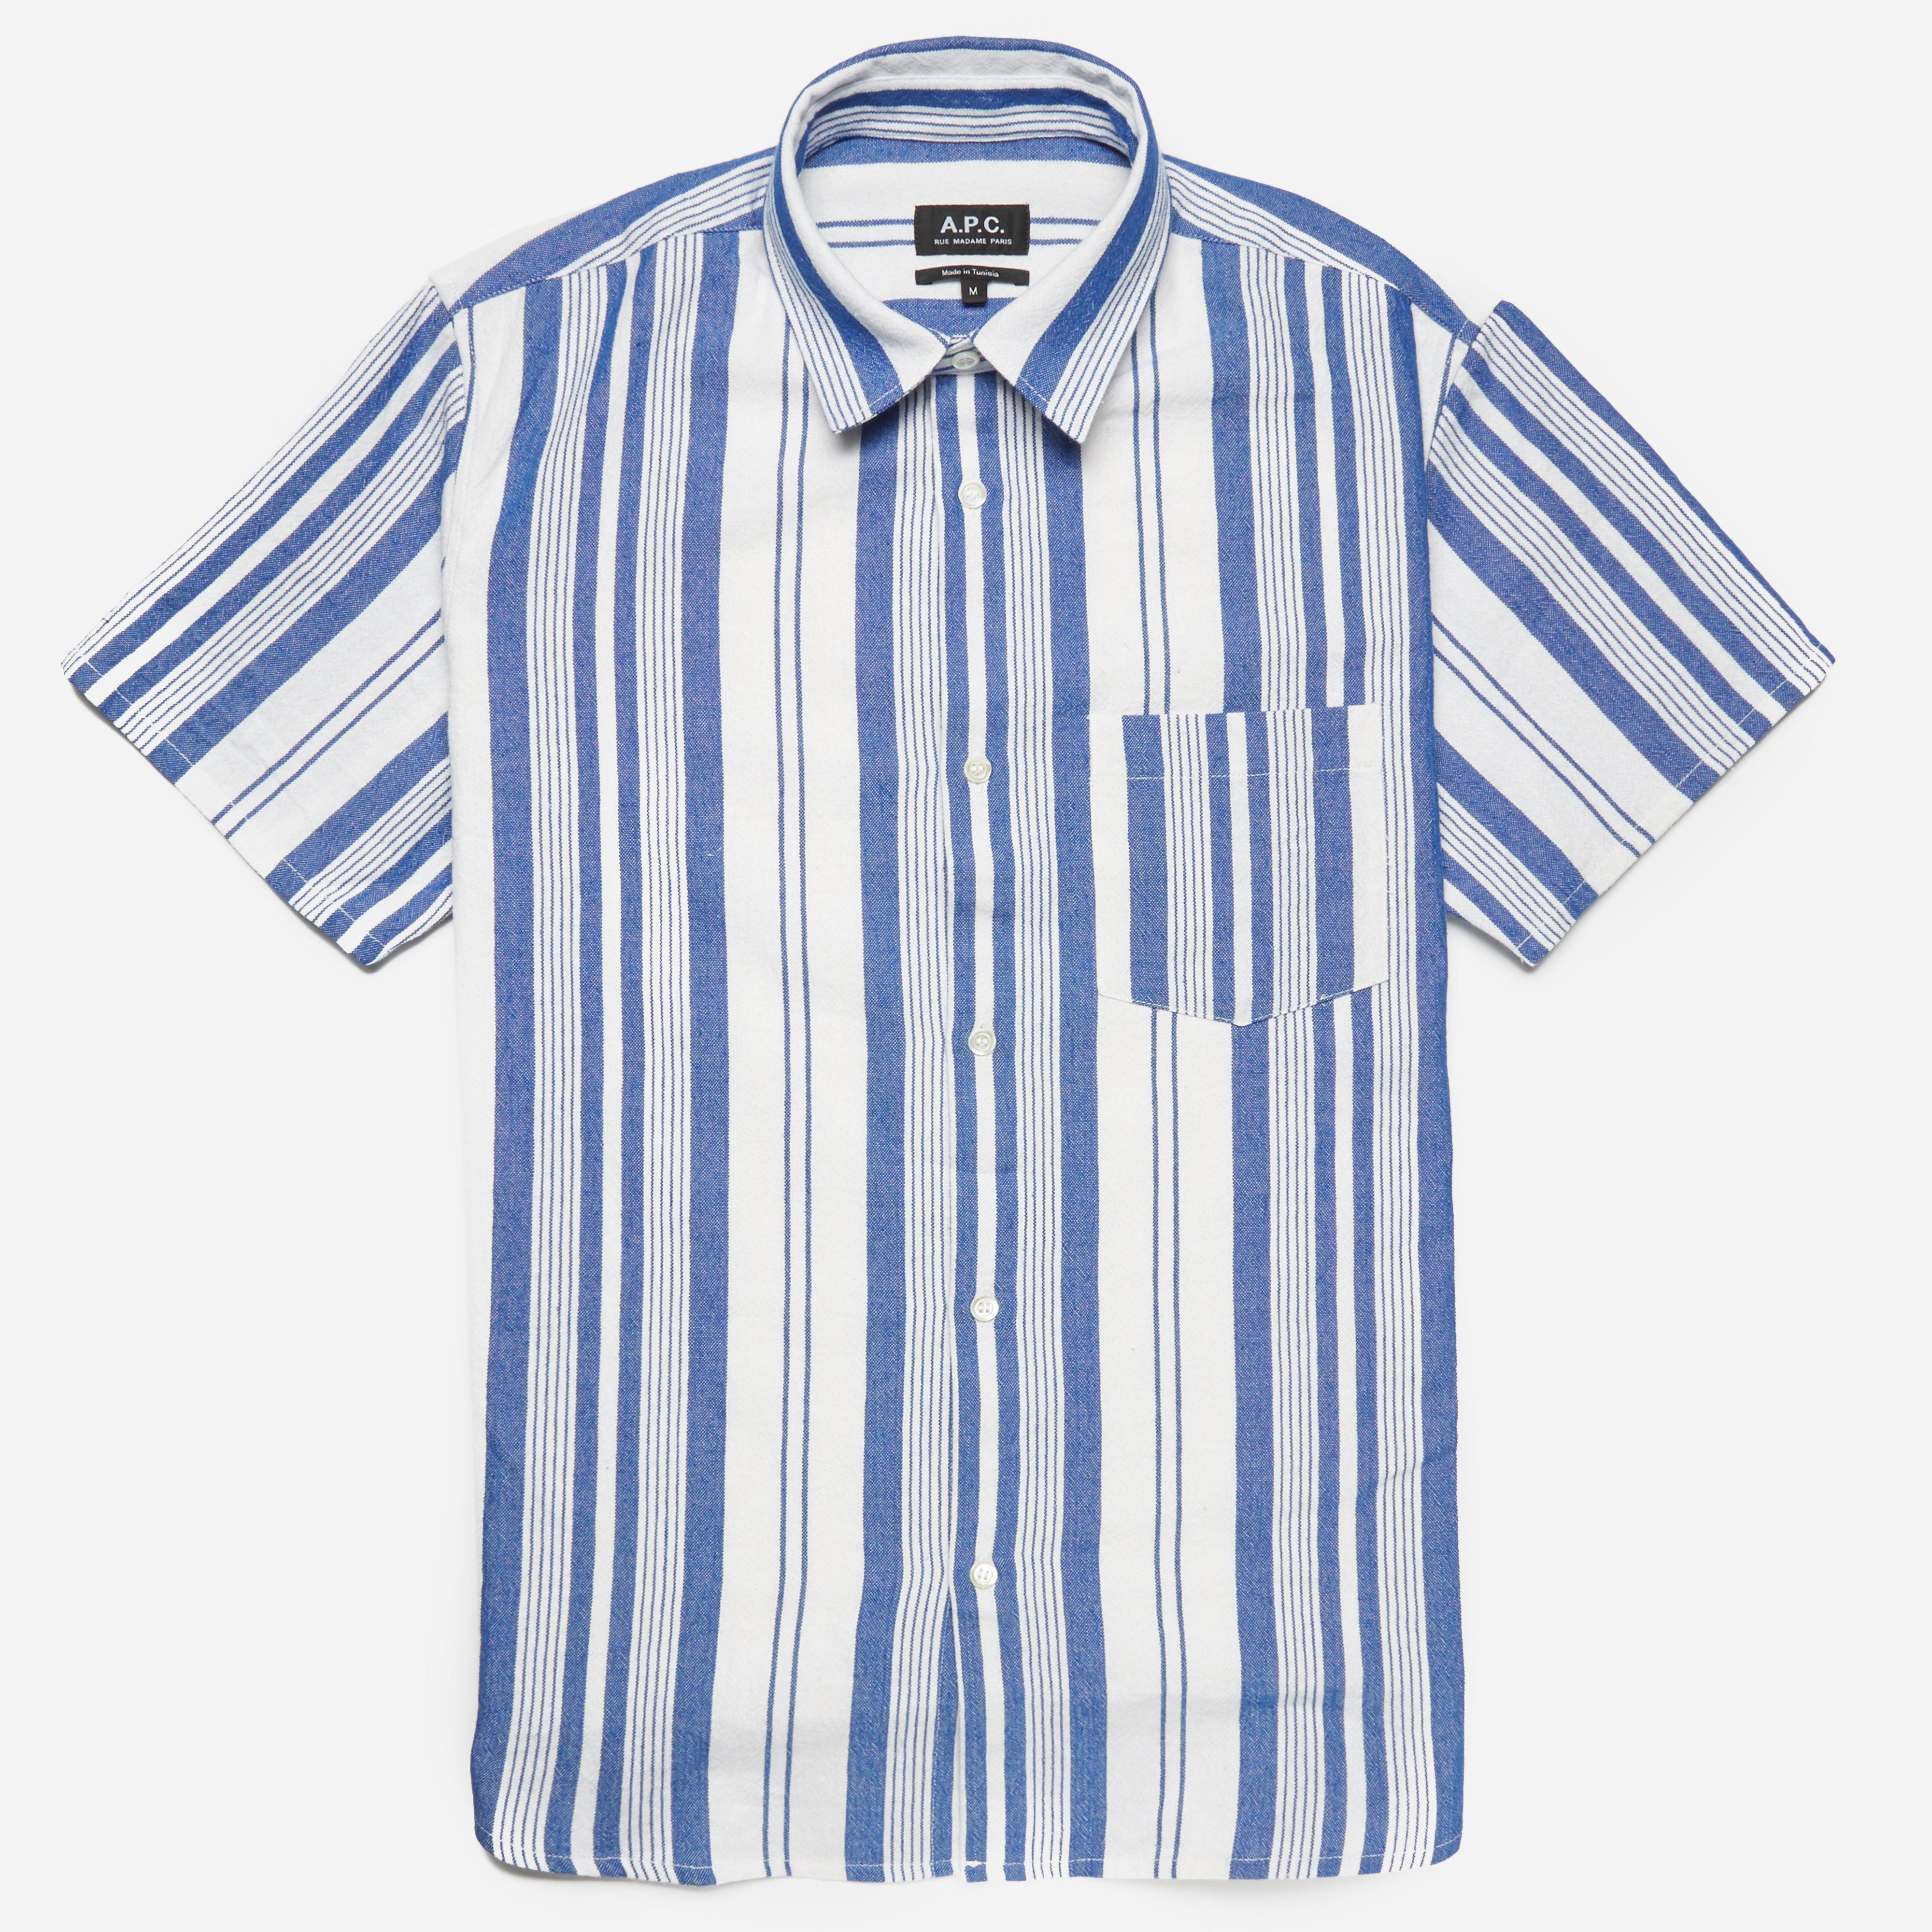 A.P.C Bryan Shirt